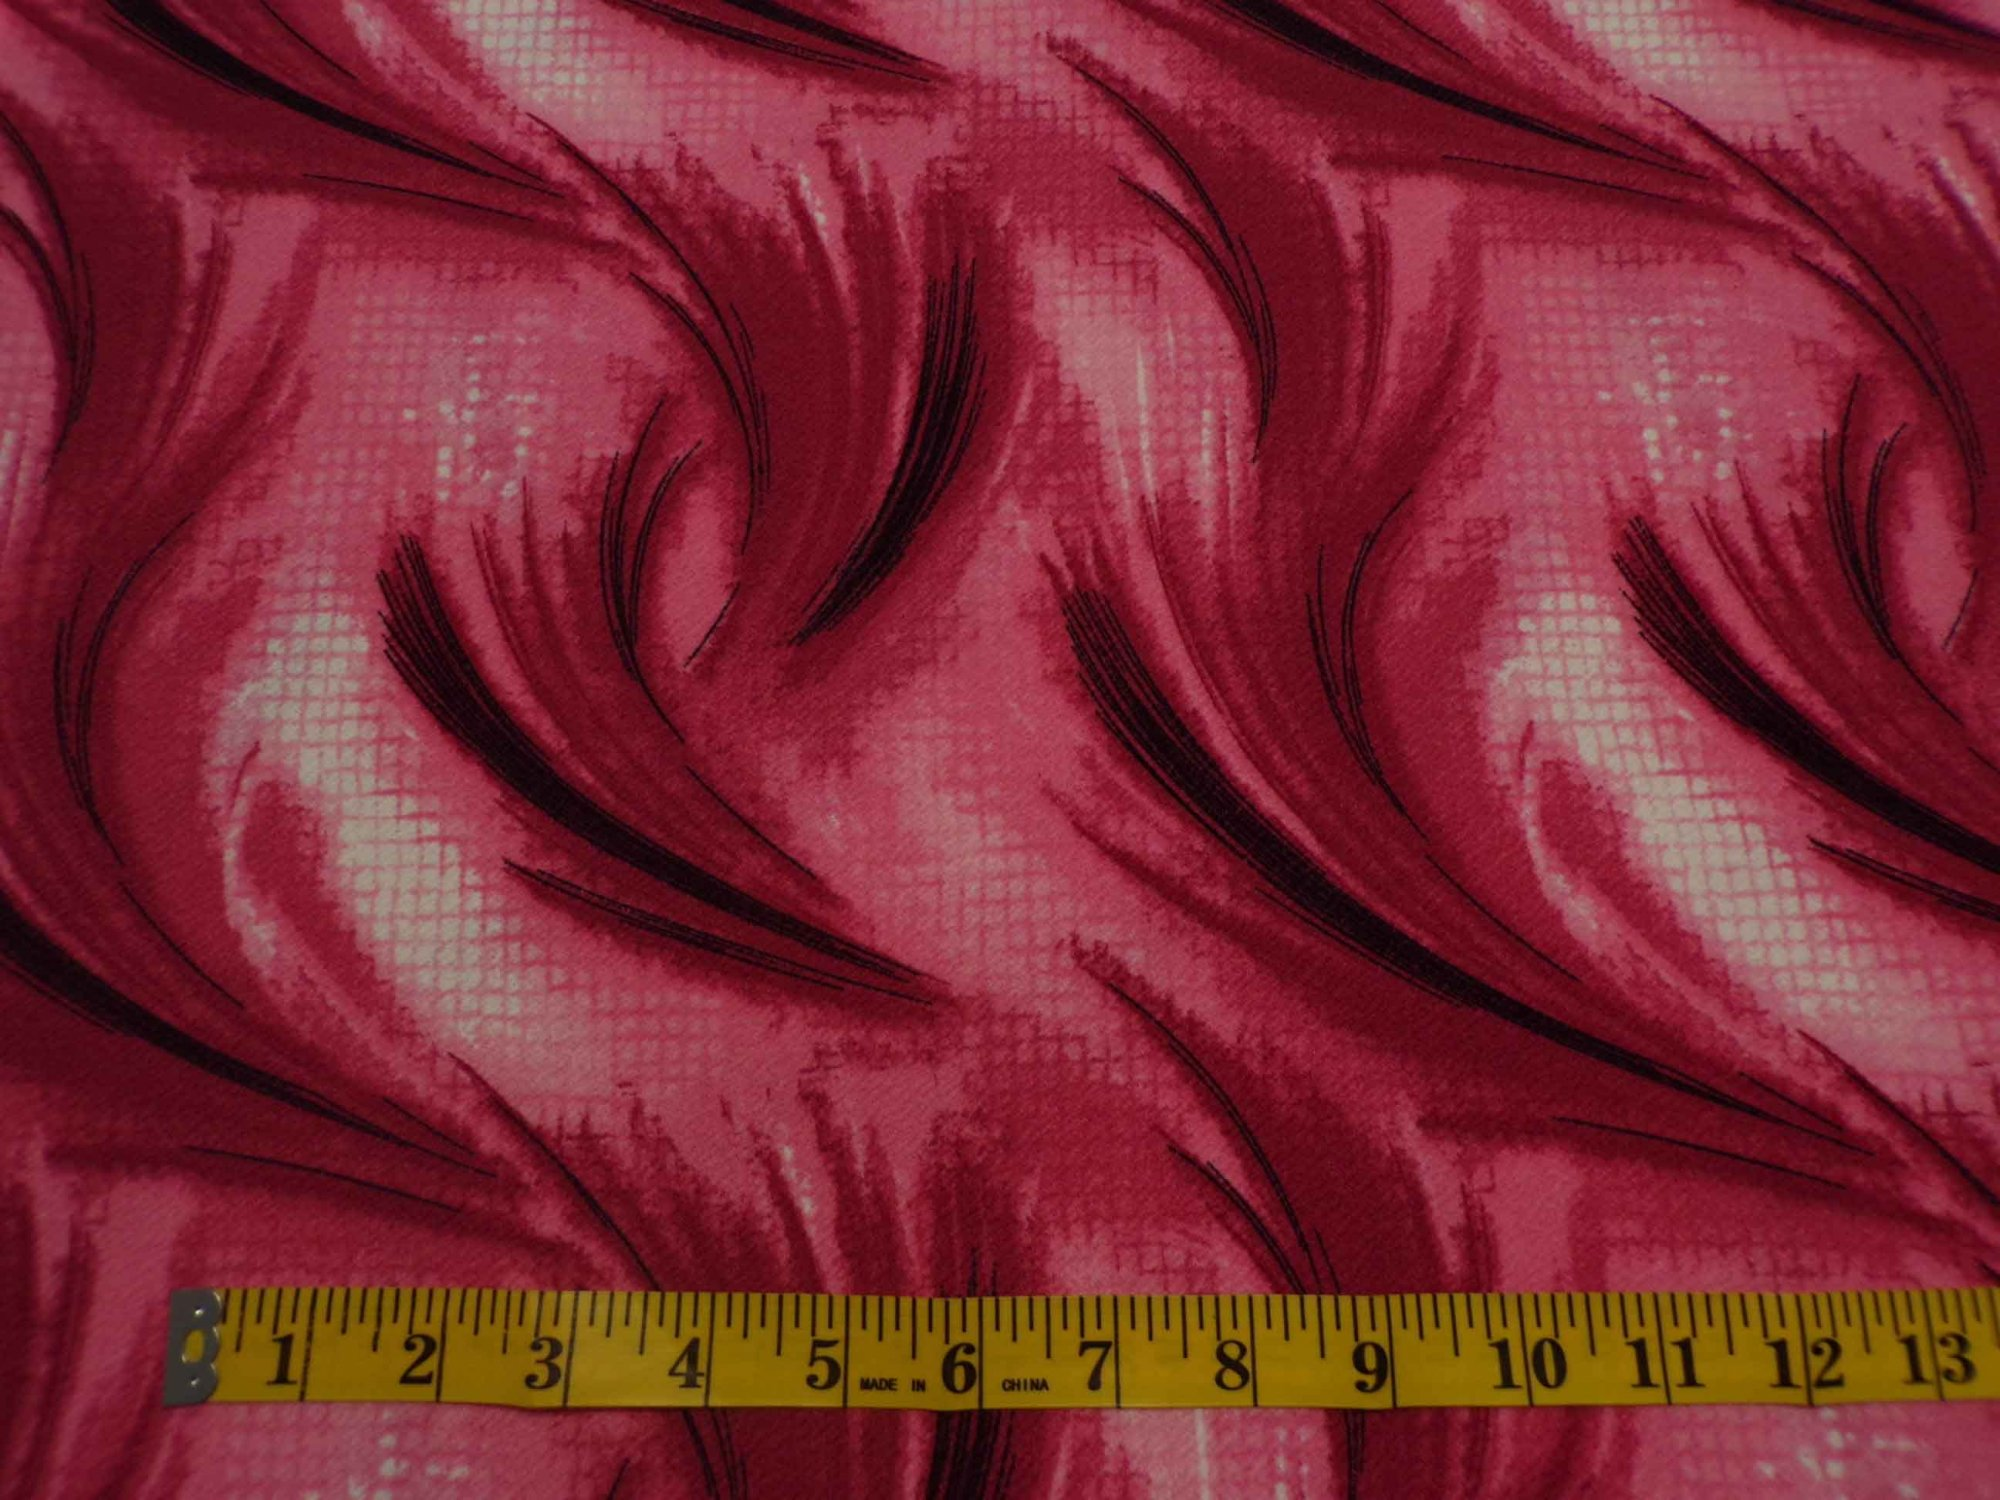 Liverpool Knit - Pink Swirl